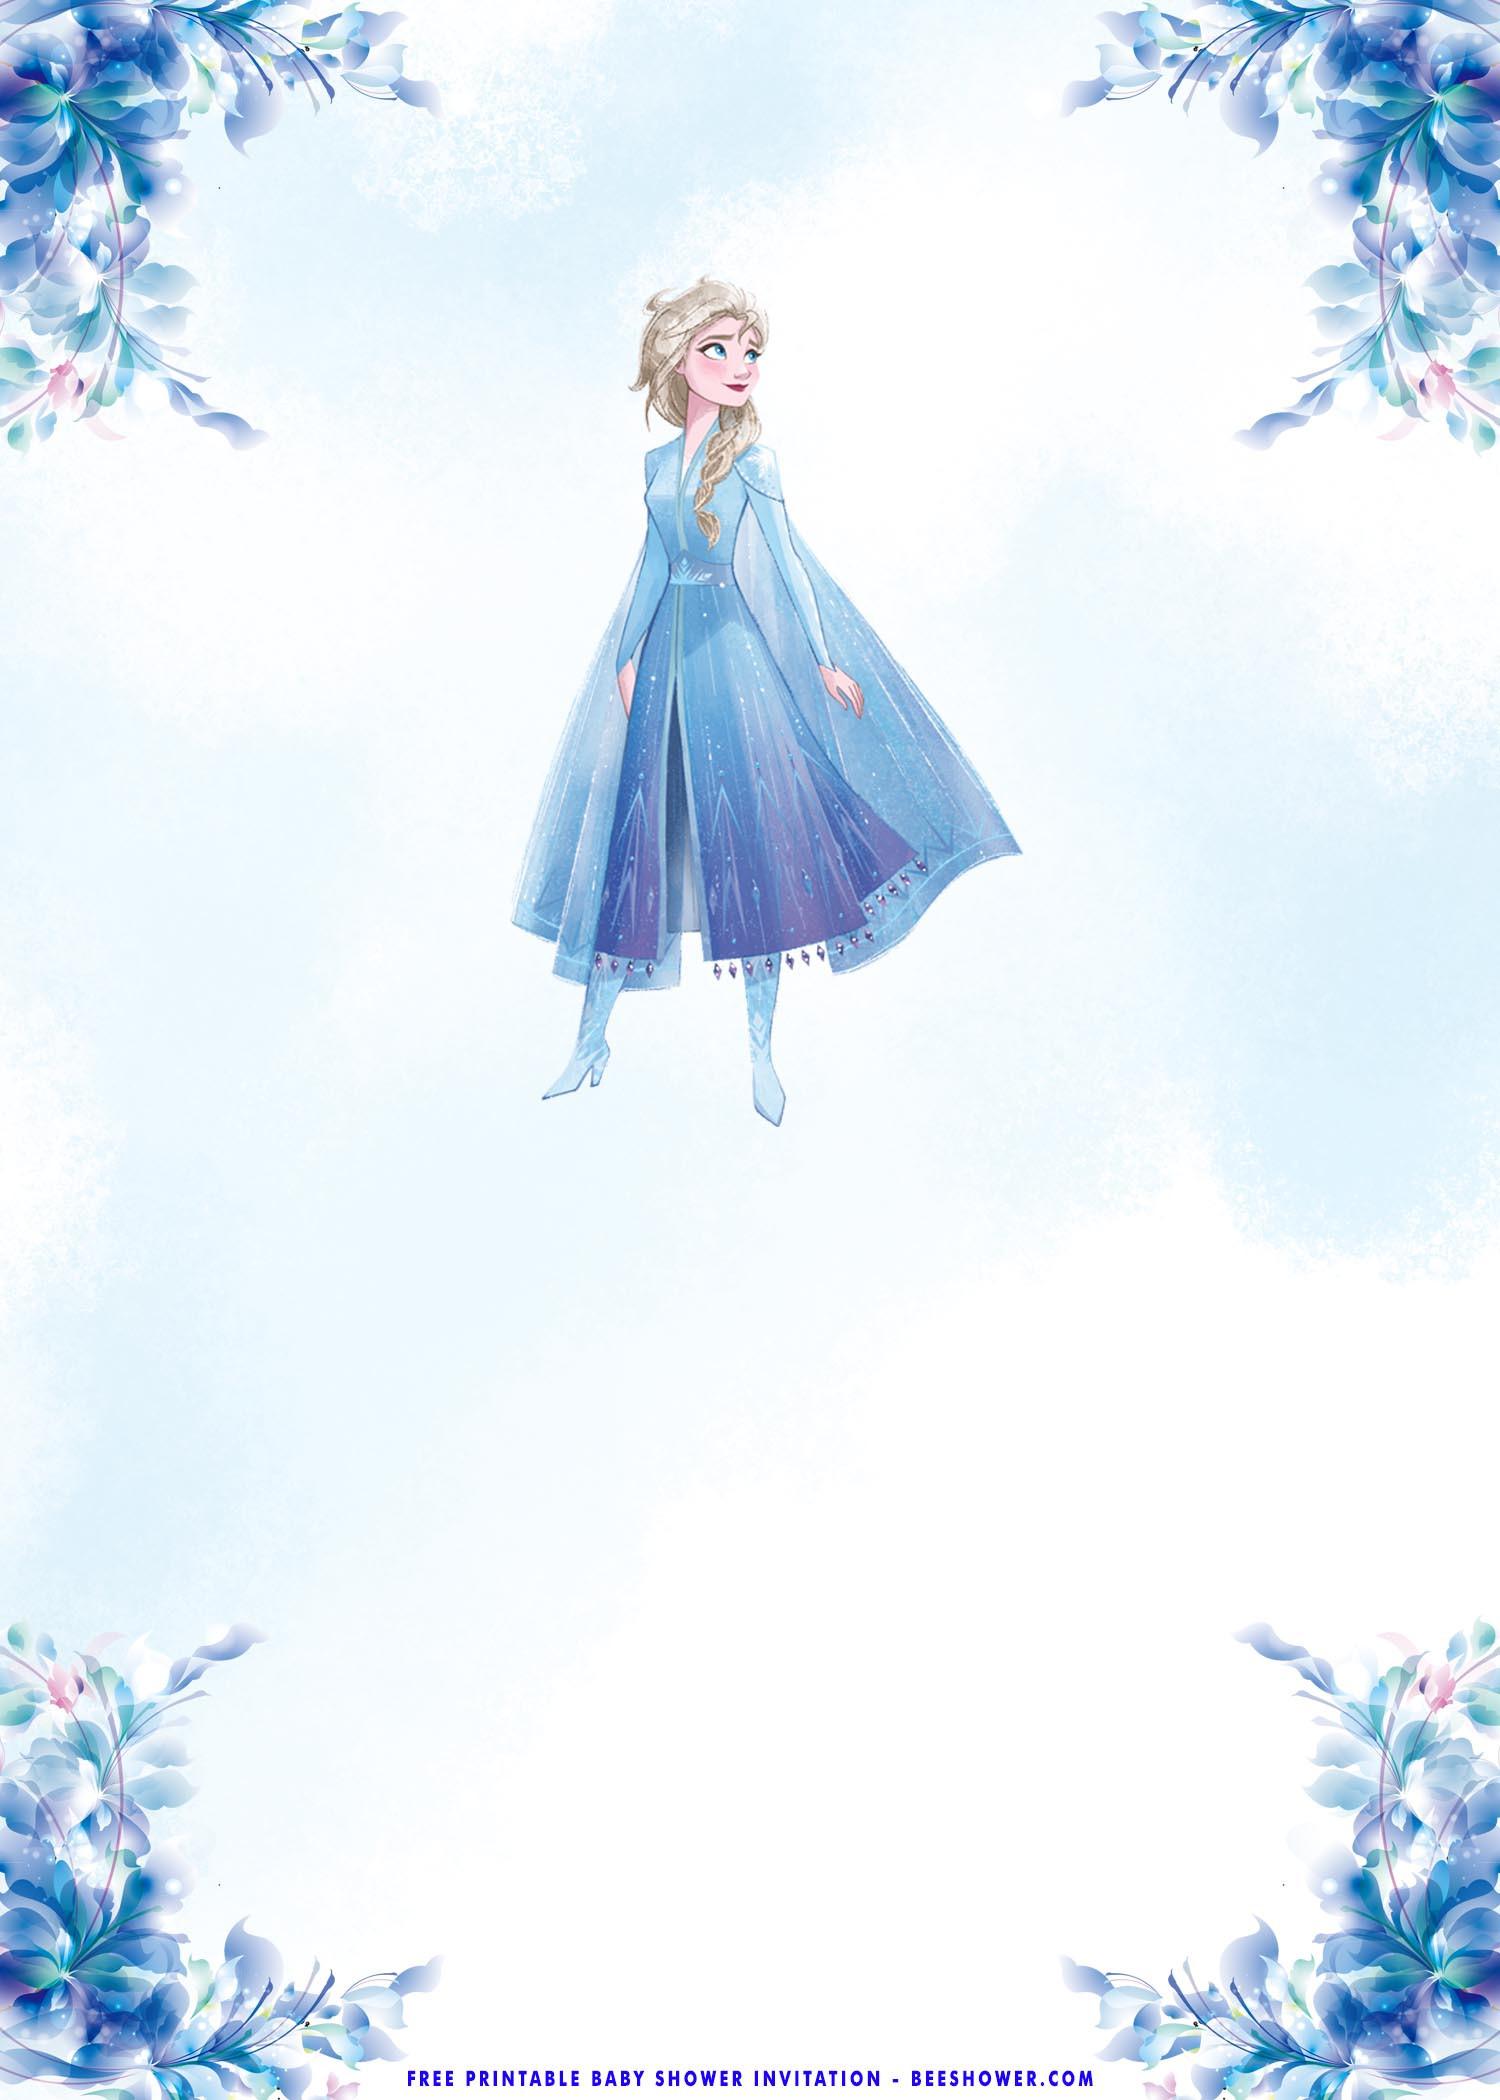 Frozen Invitations Printable Free Printable – Frozen Elsa Baby Shower Invitation